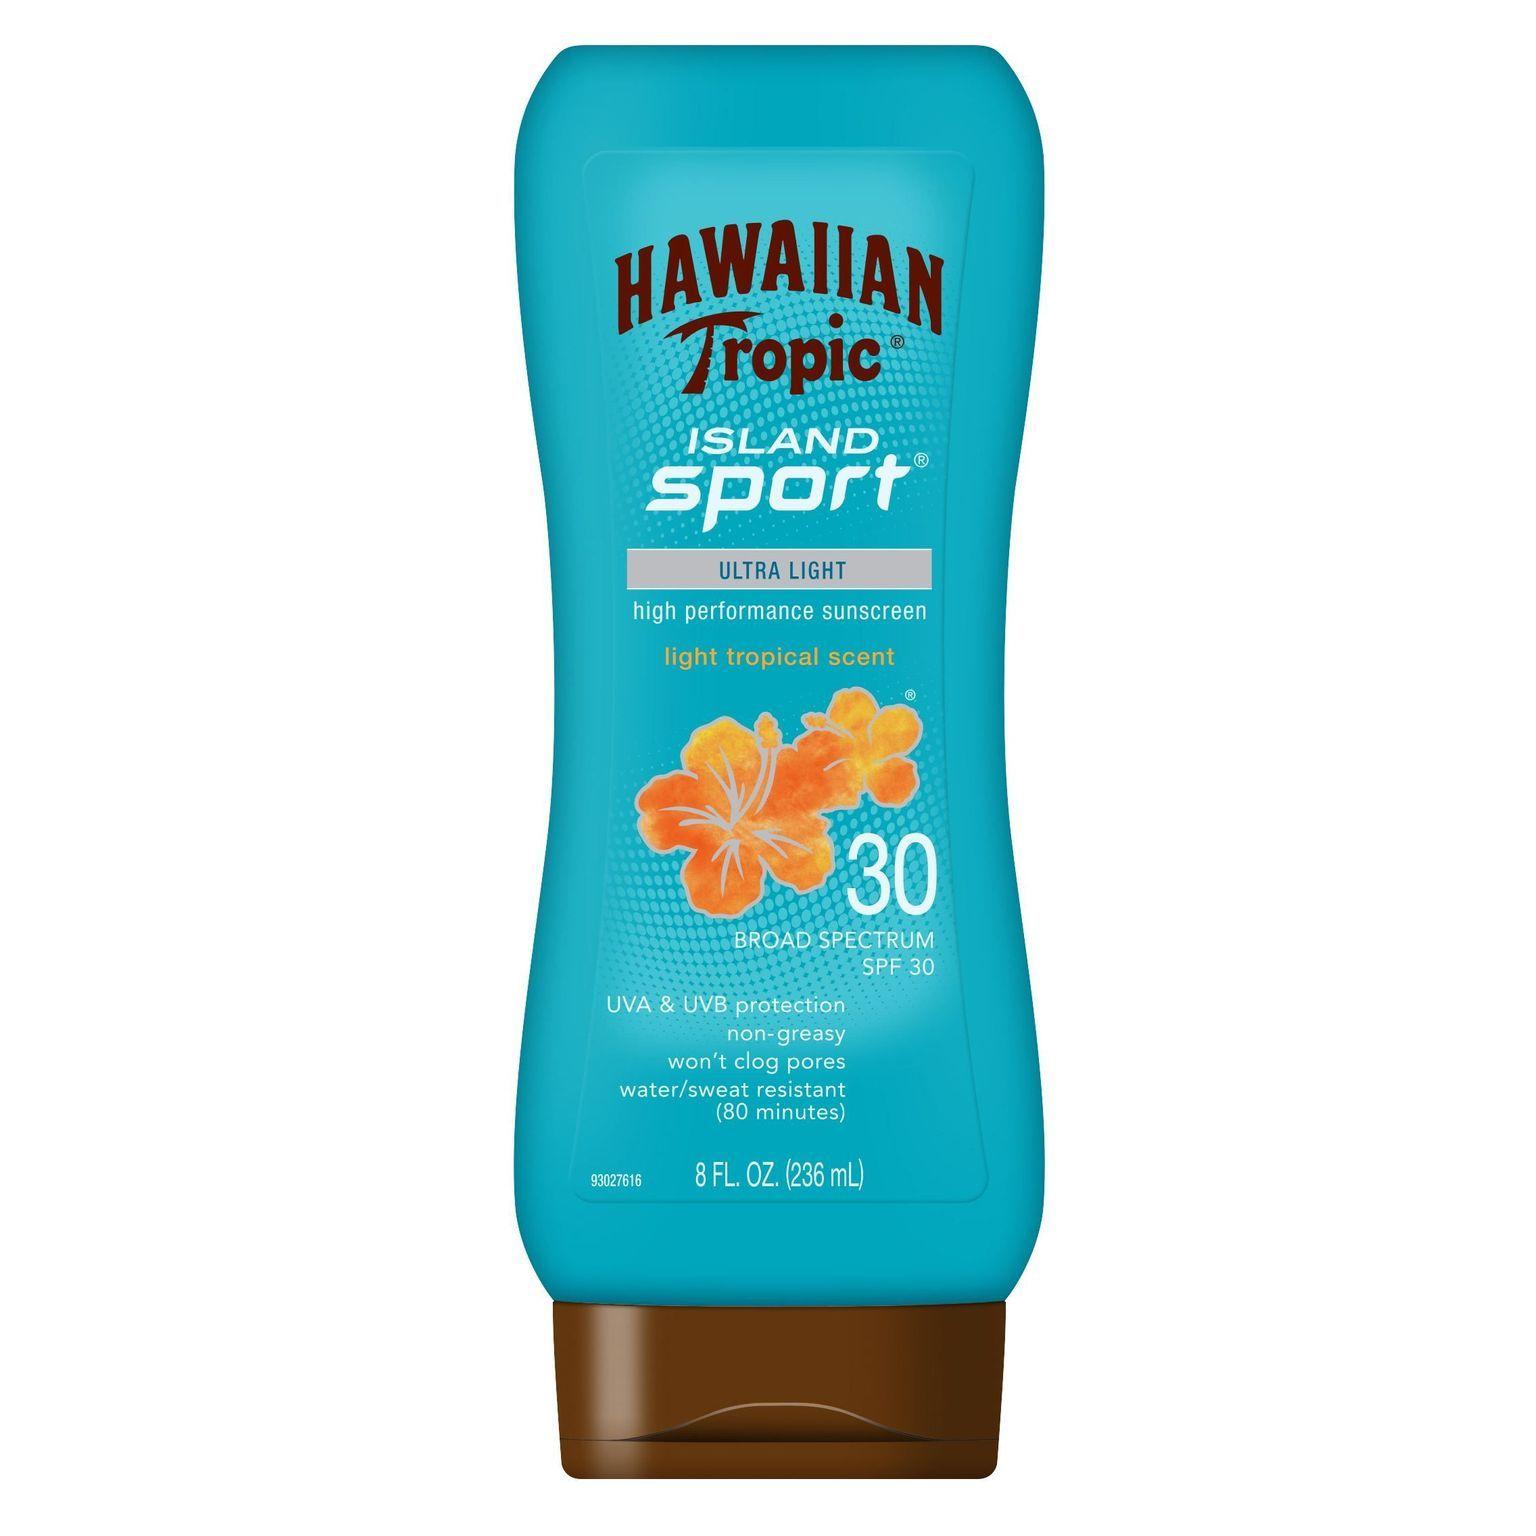 Island Sport High Performance Sunscreen Lotion SPF 30